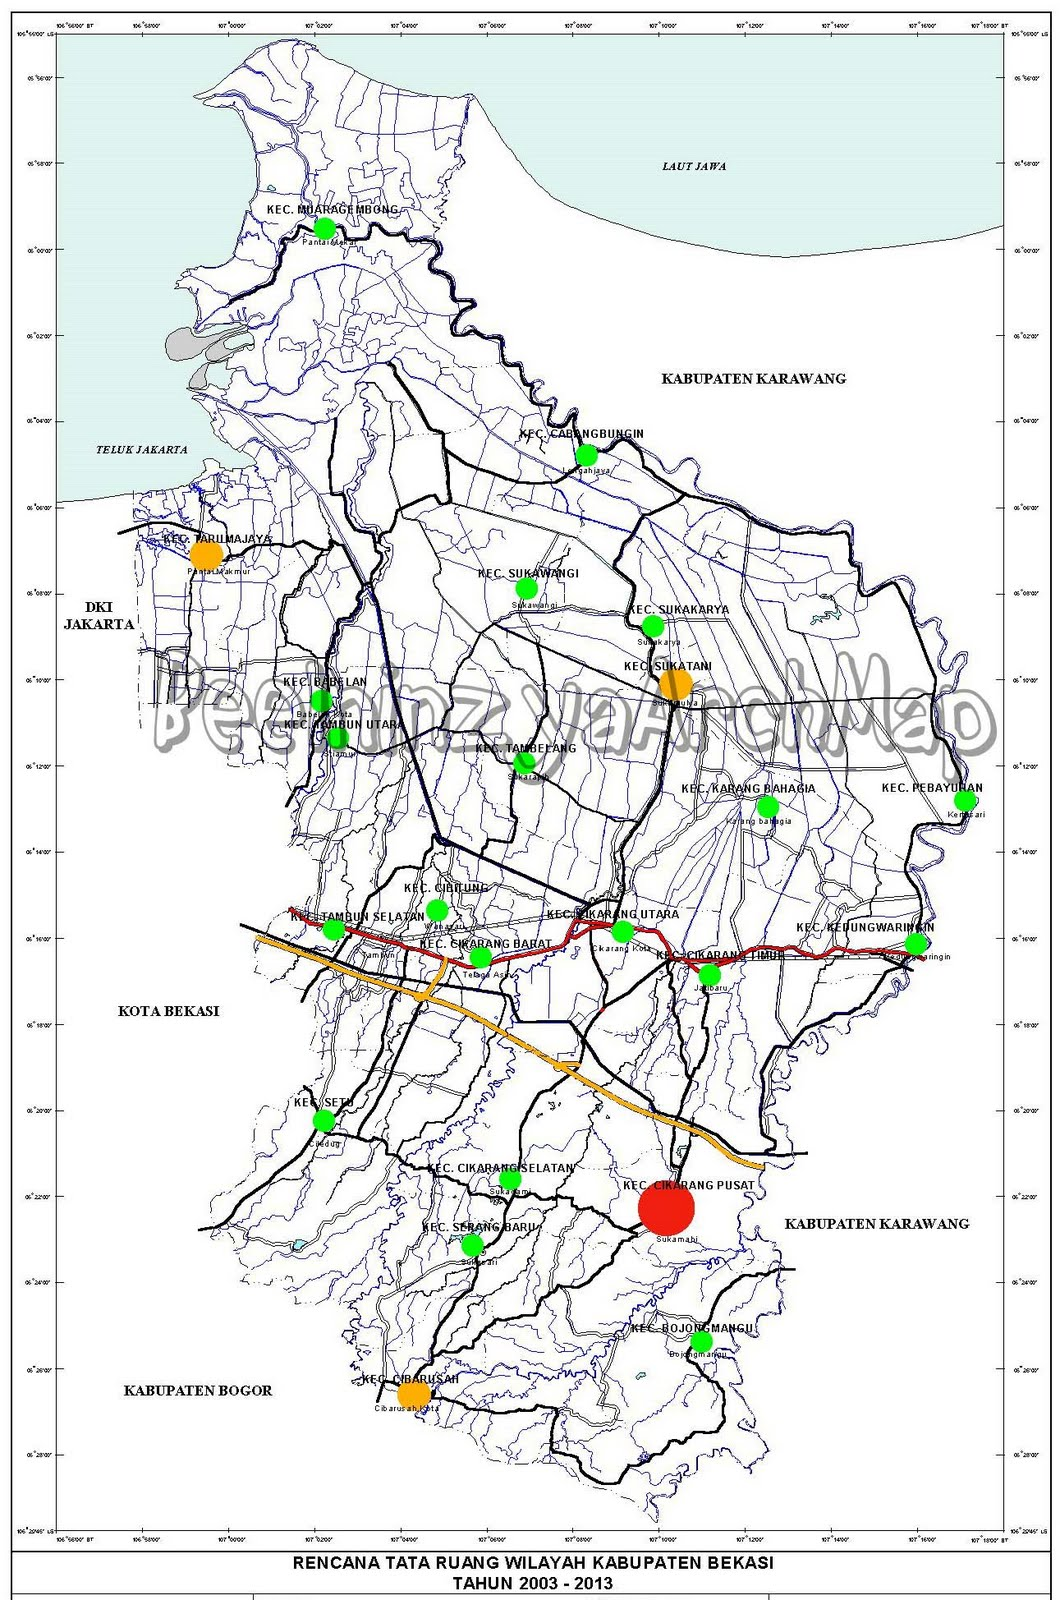 BeelninzyaArchMap Rencana Tata Ruang Wilayah Kabupaten